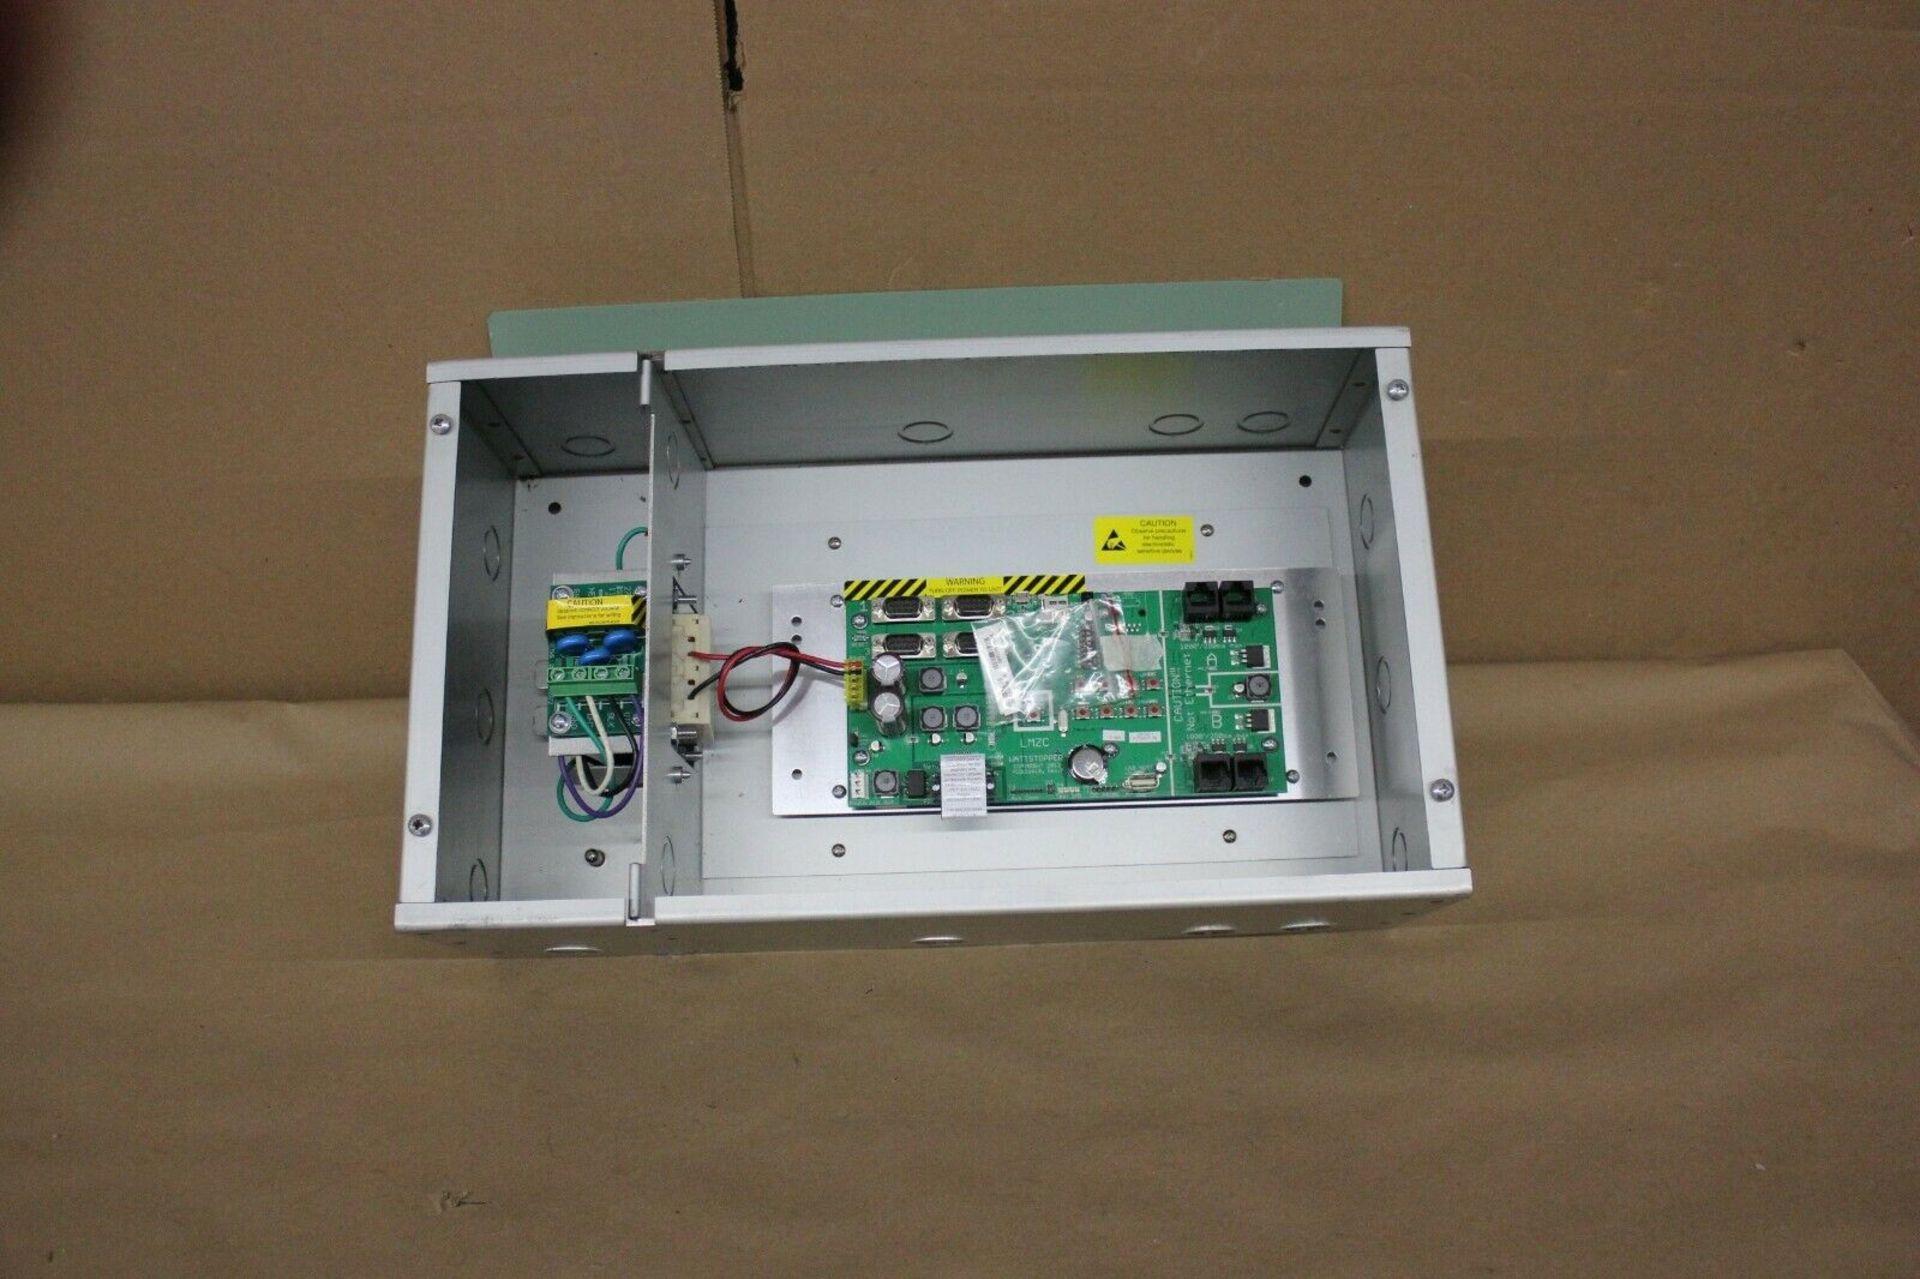 UNUSED WATTSTOPPER DLM ZONE CONTROLLER, SCHEDULER & NETWORK INTERFACE - Image 2 of 6